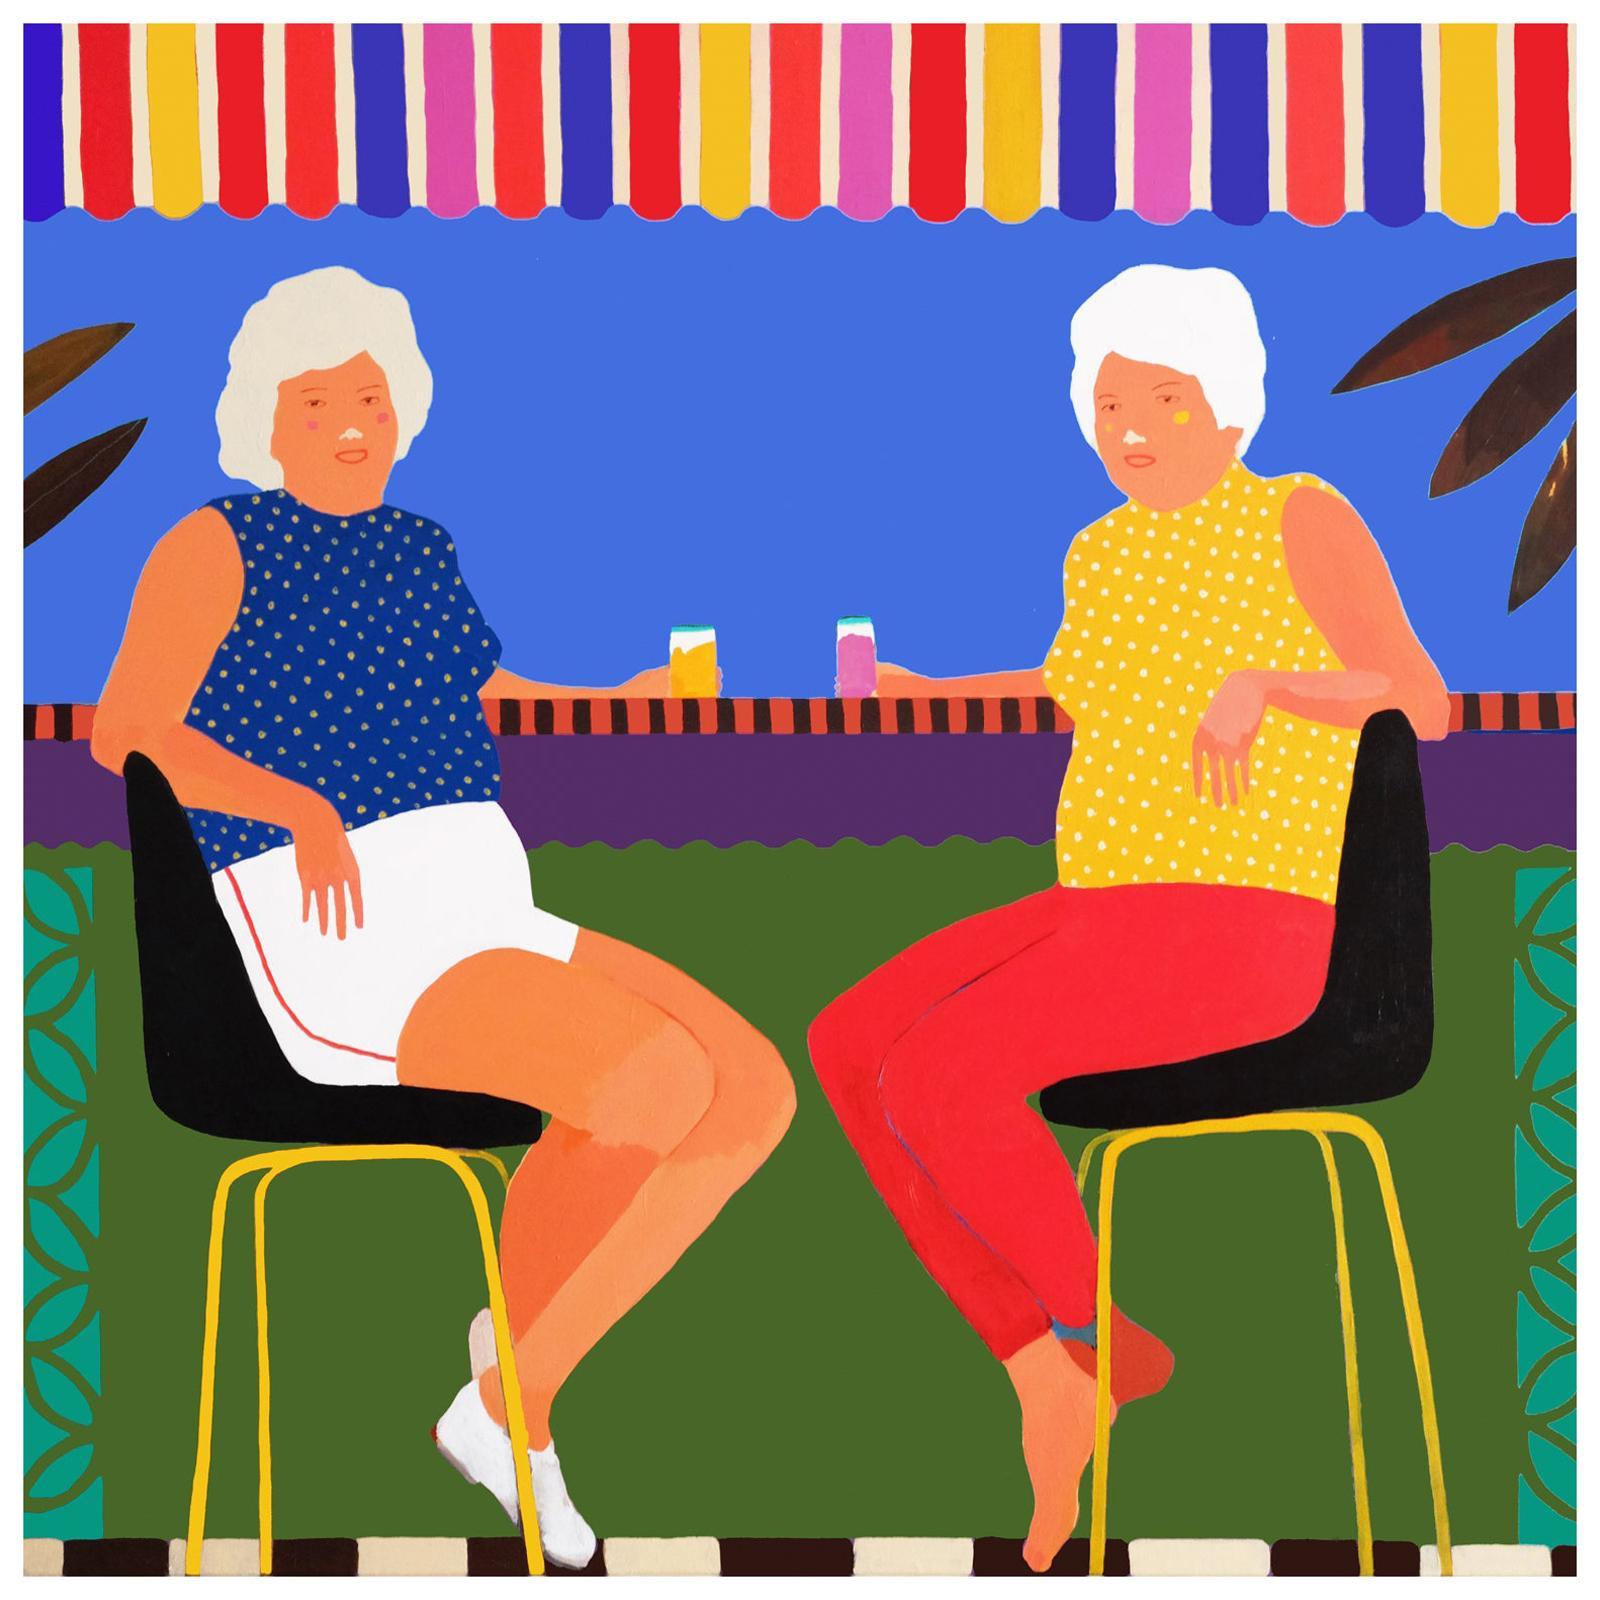 'Buy One Get One Free' Portrait Painting by Alan Fears Pop Art Figurative